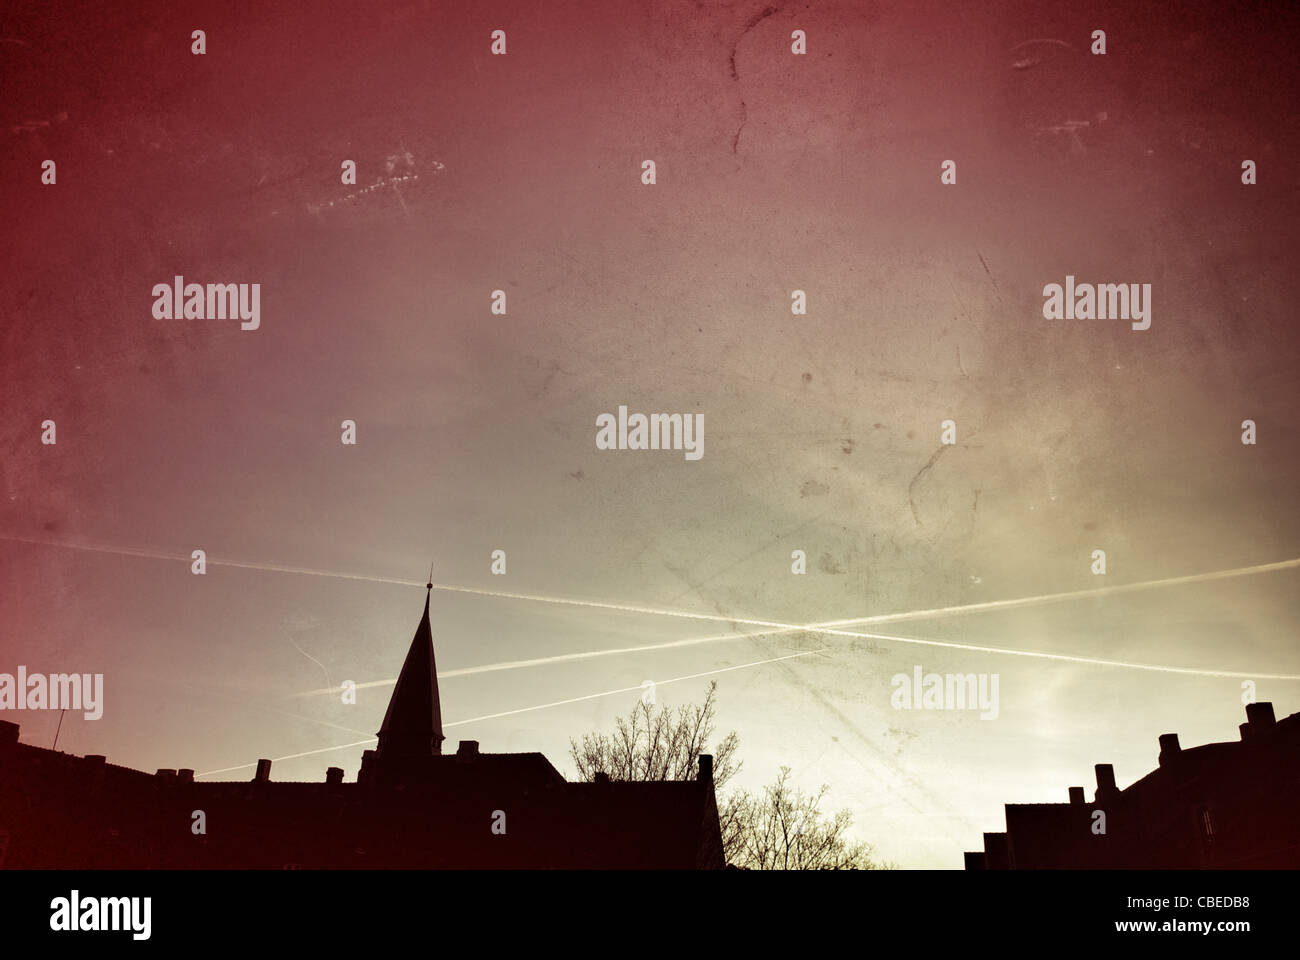 URBAN SUNRISE WITH VAPOR TRAILS - Stock Image